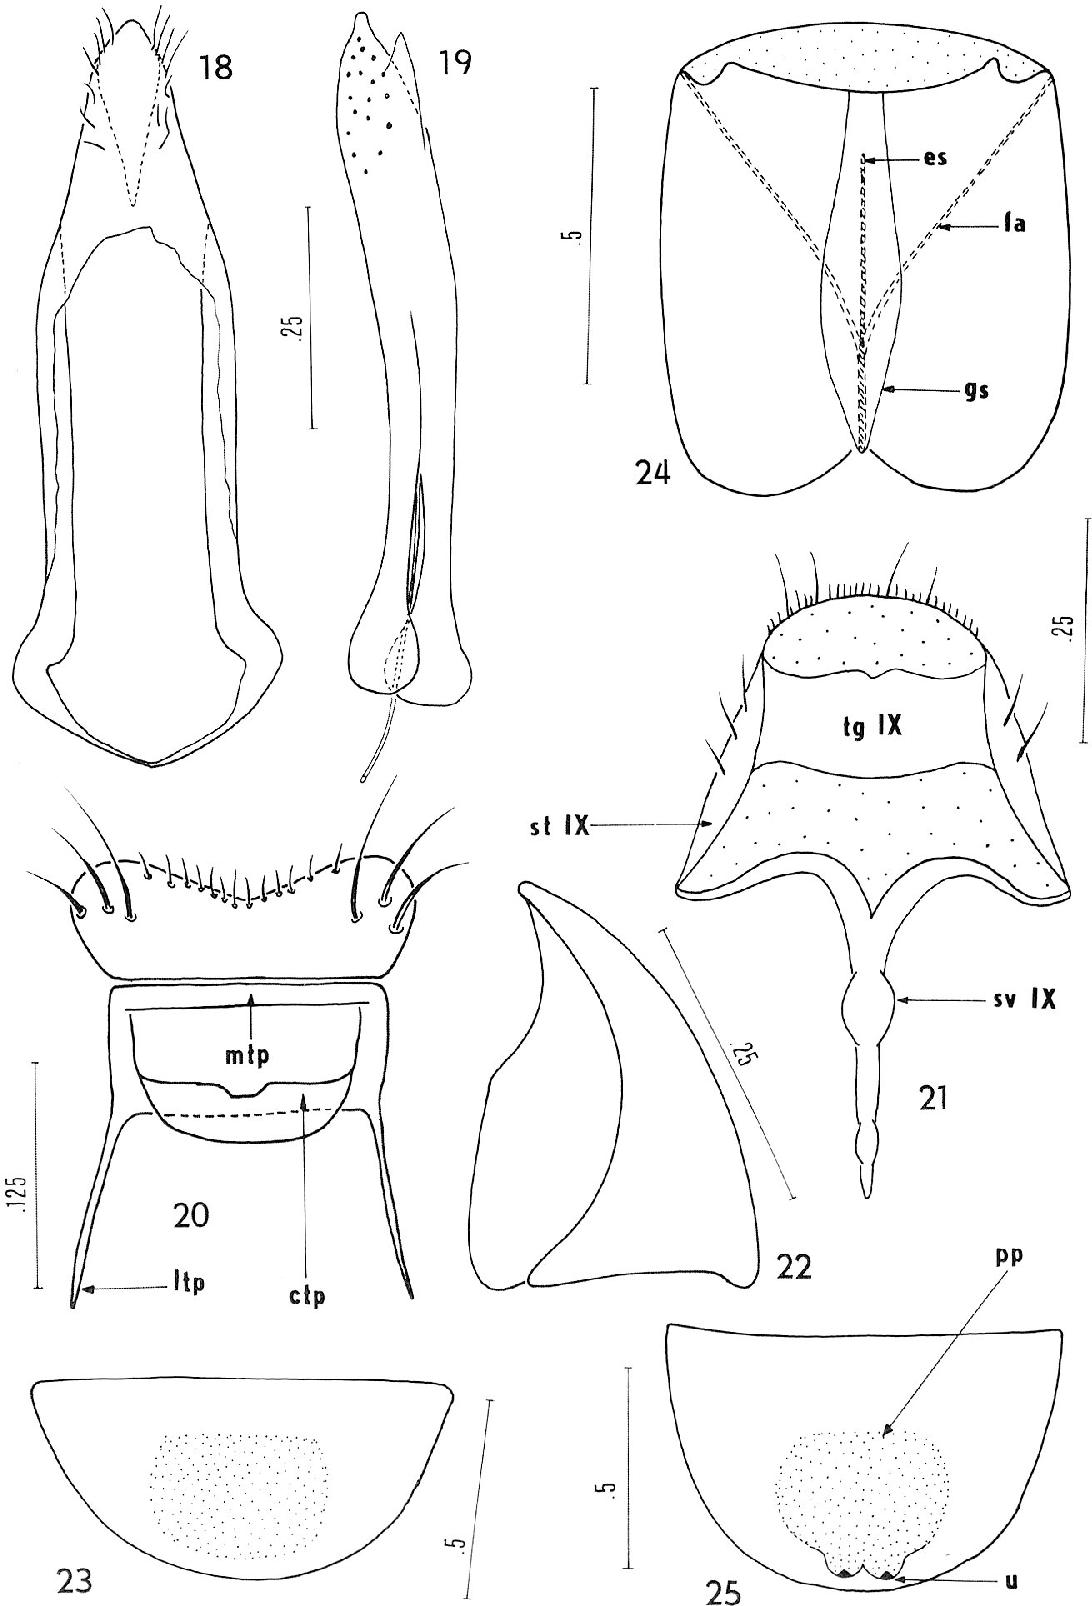 figure 18-25